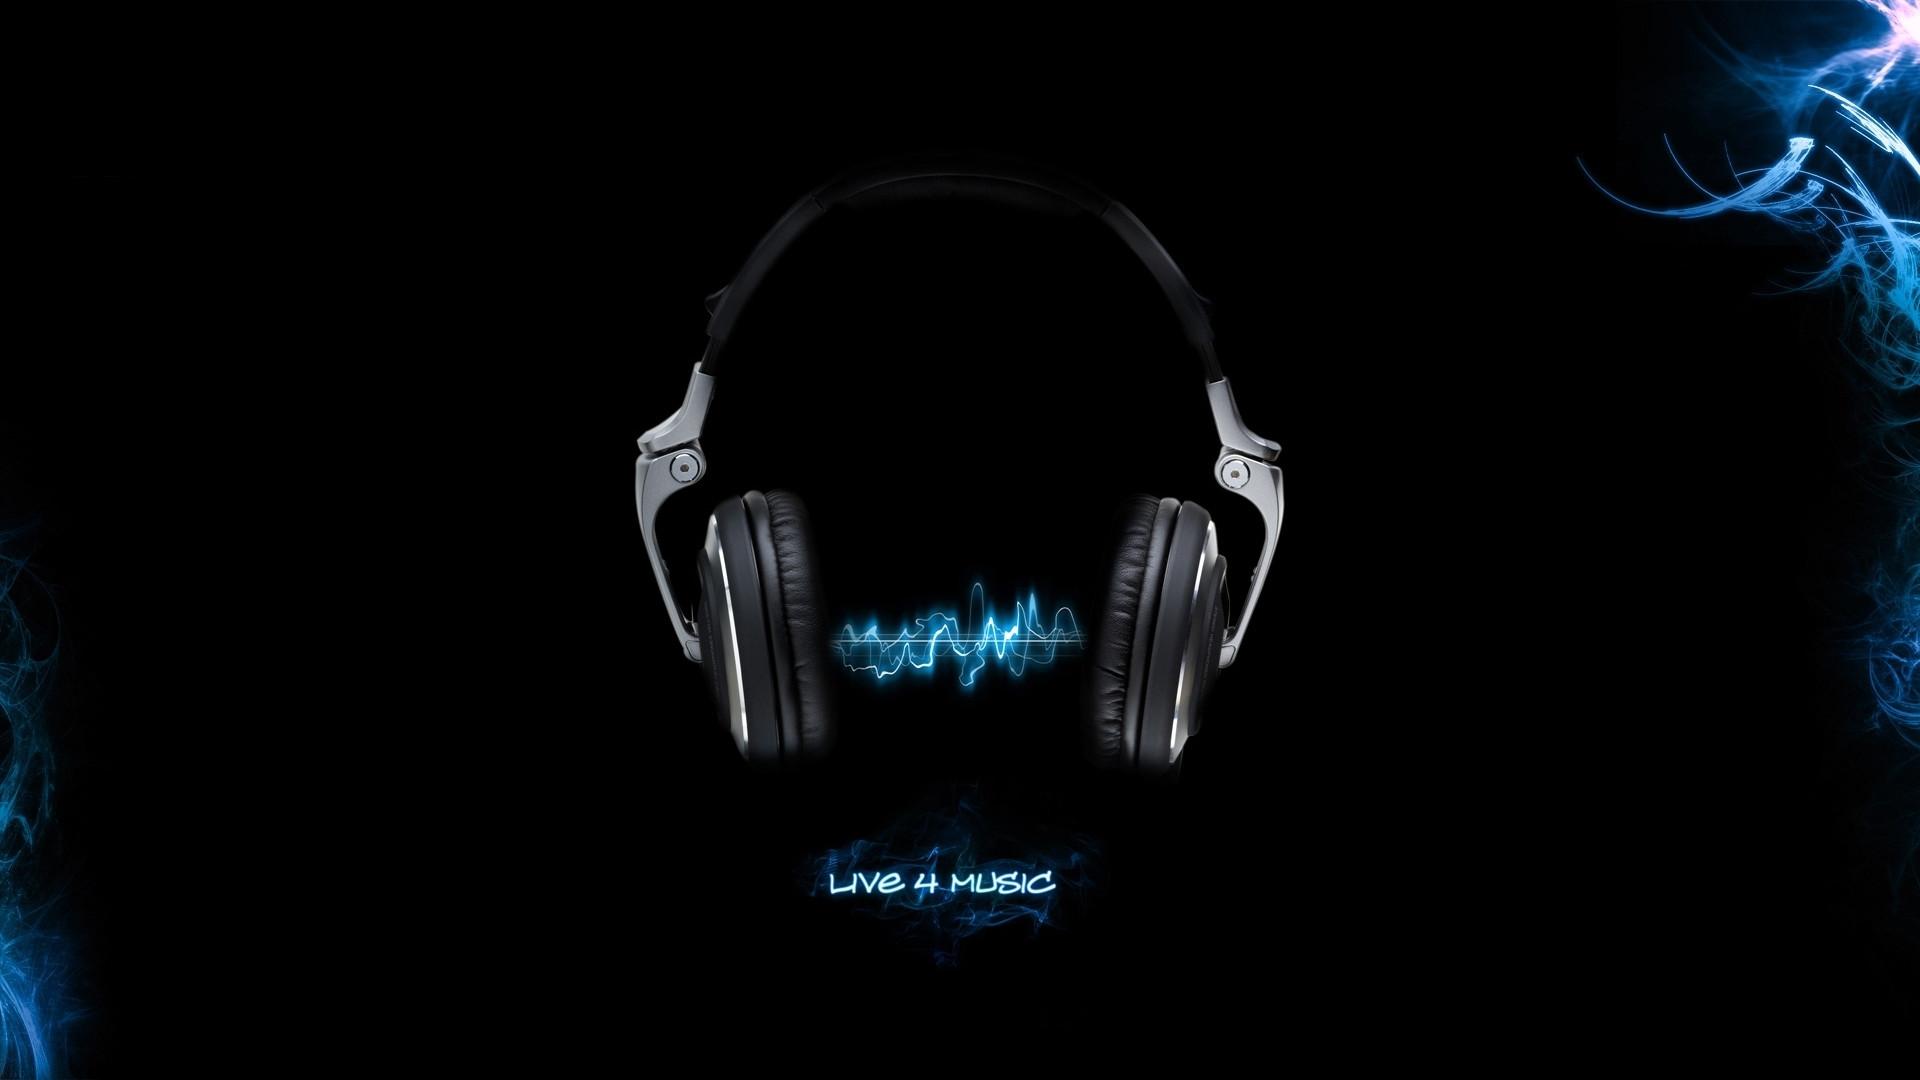 Headset Live for Music & HD Wallpaper Music